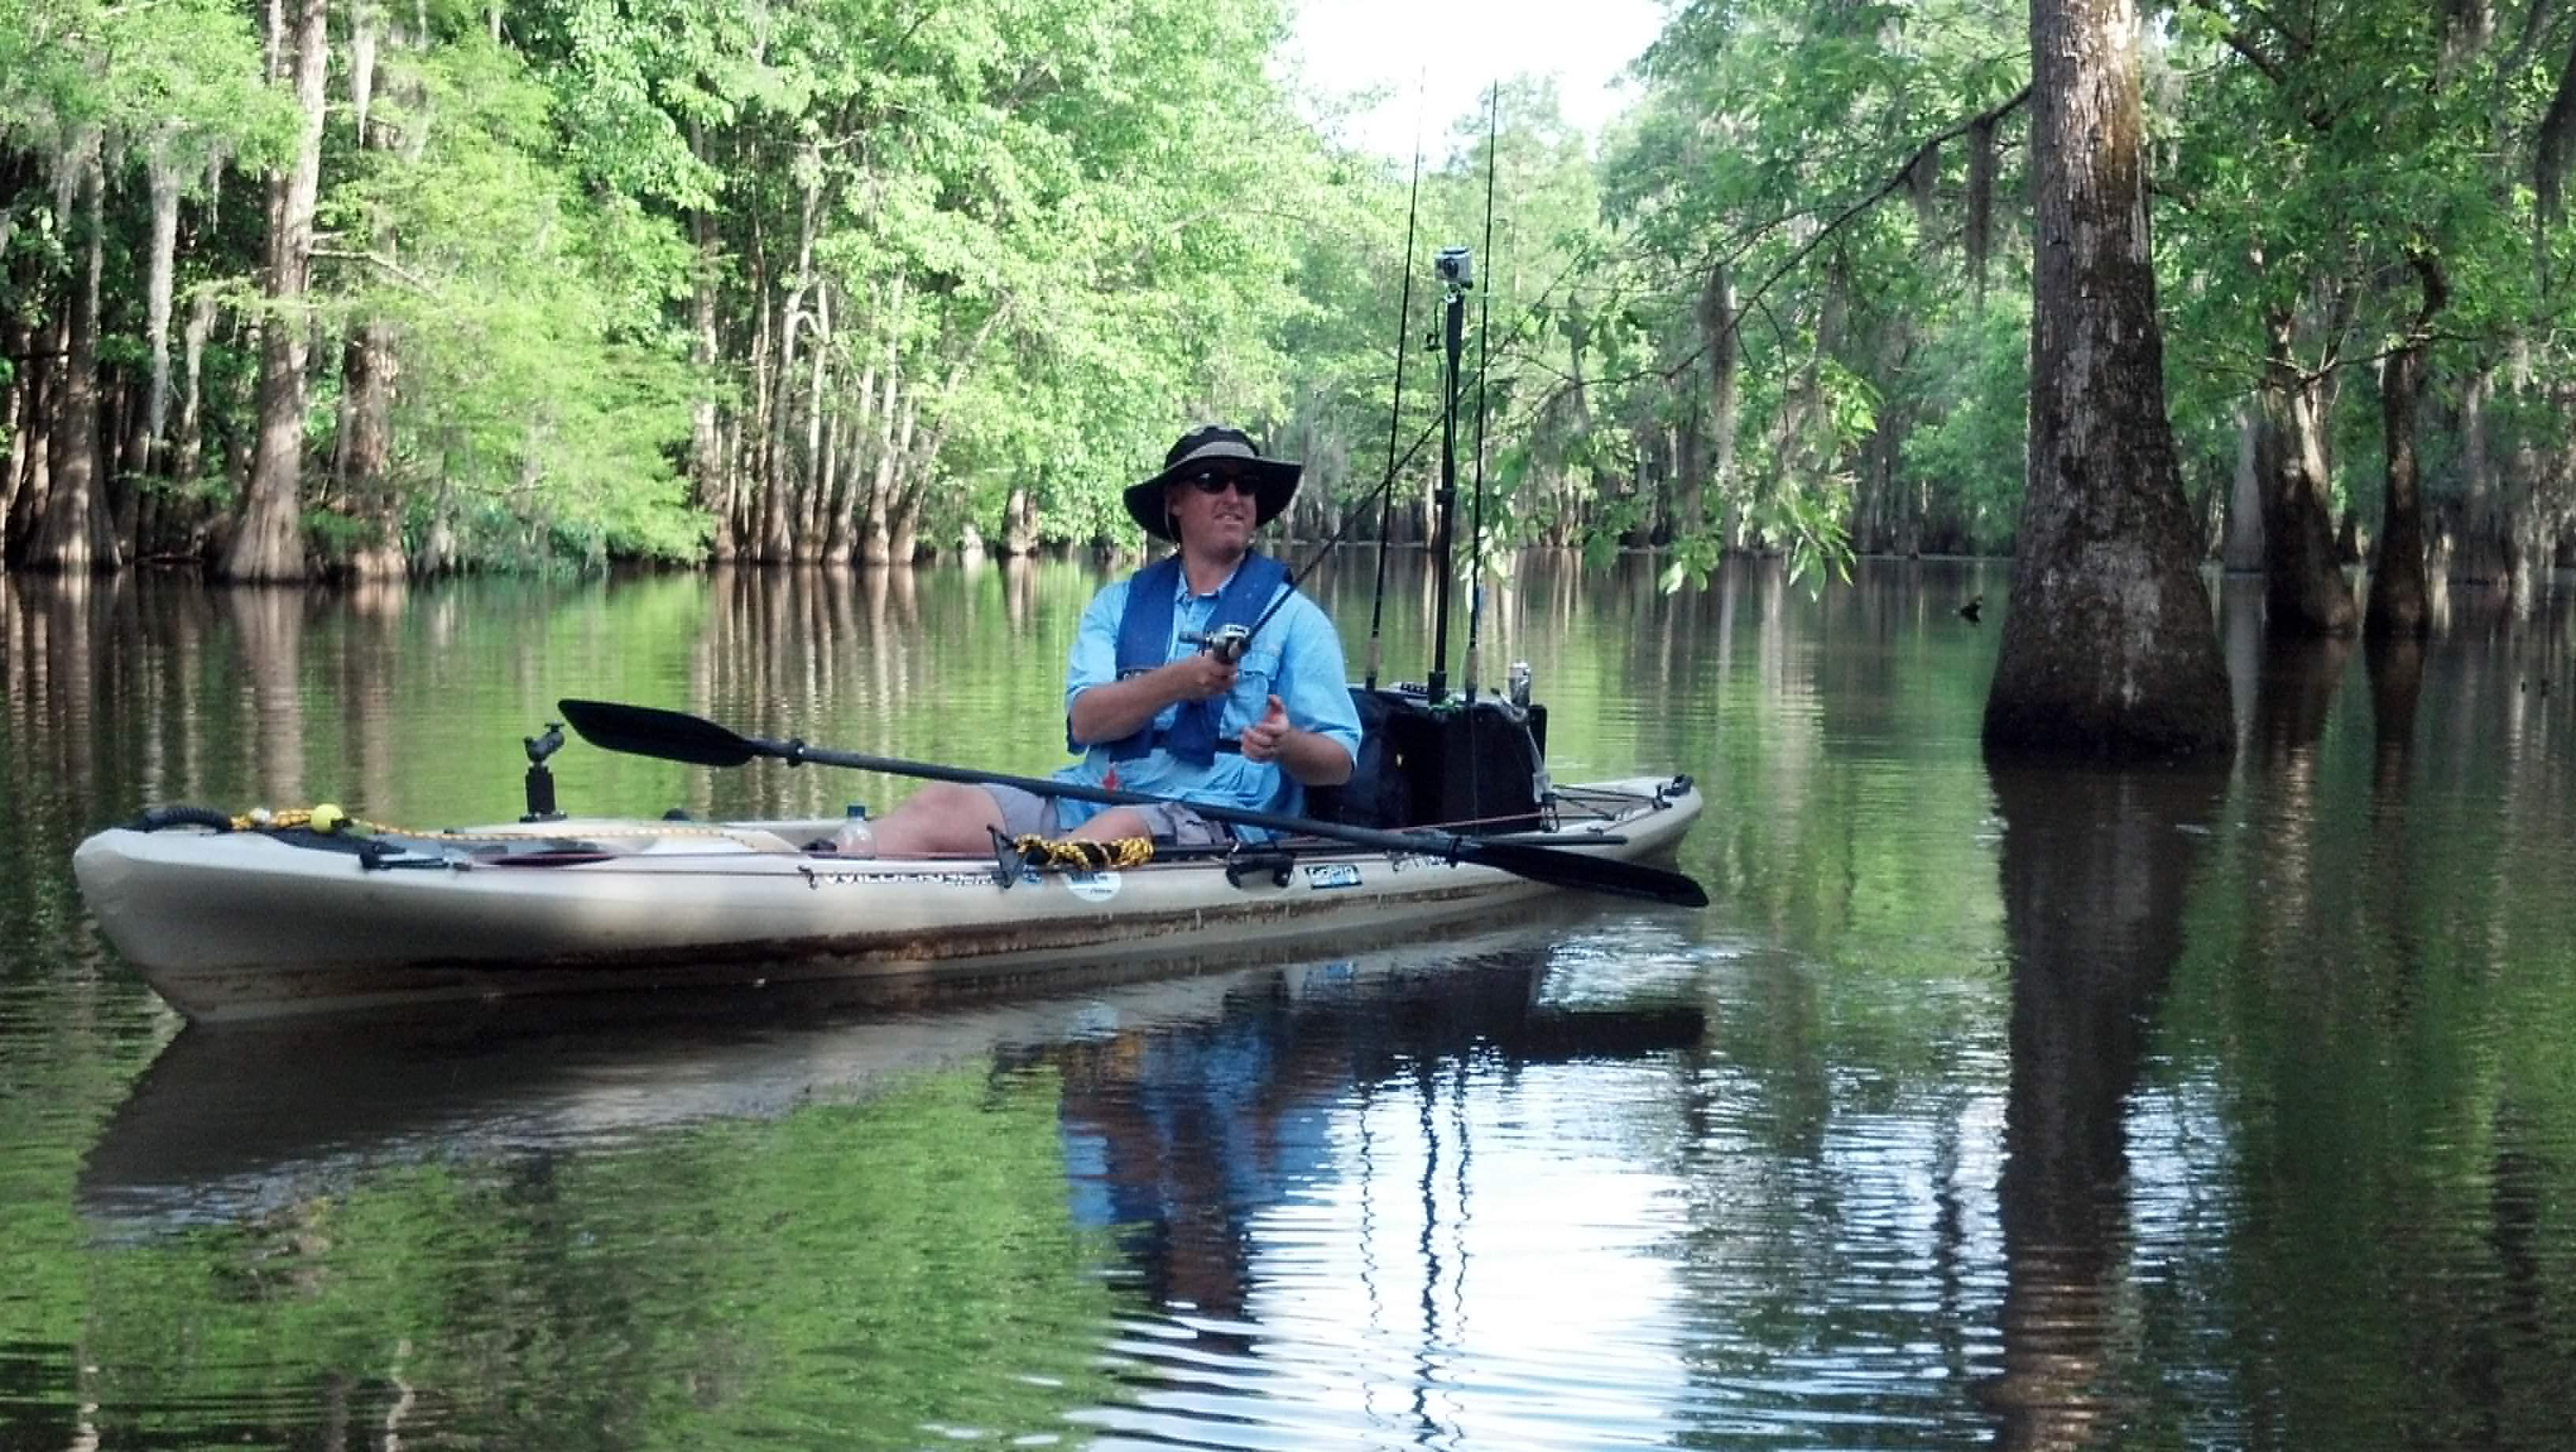 Your guides sc kayak fishing adventures for Kayak fishing tournaments near me